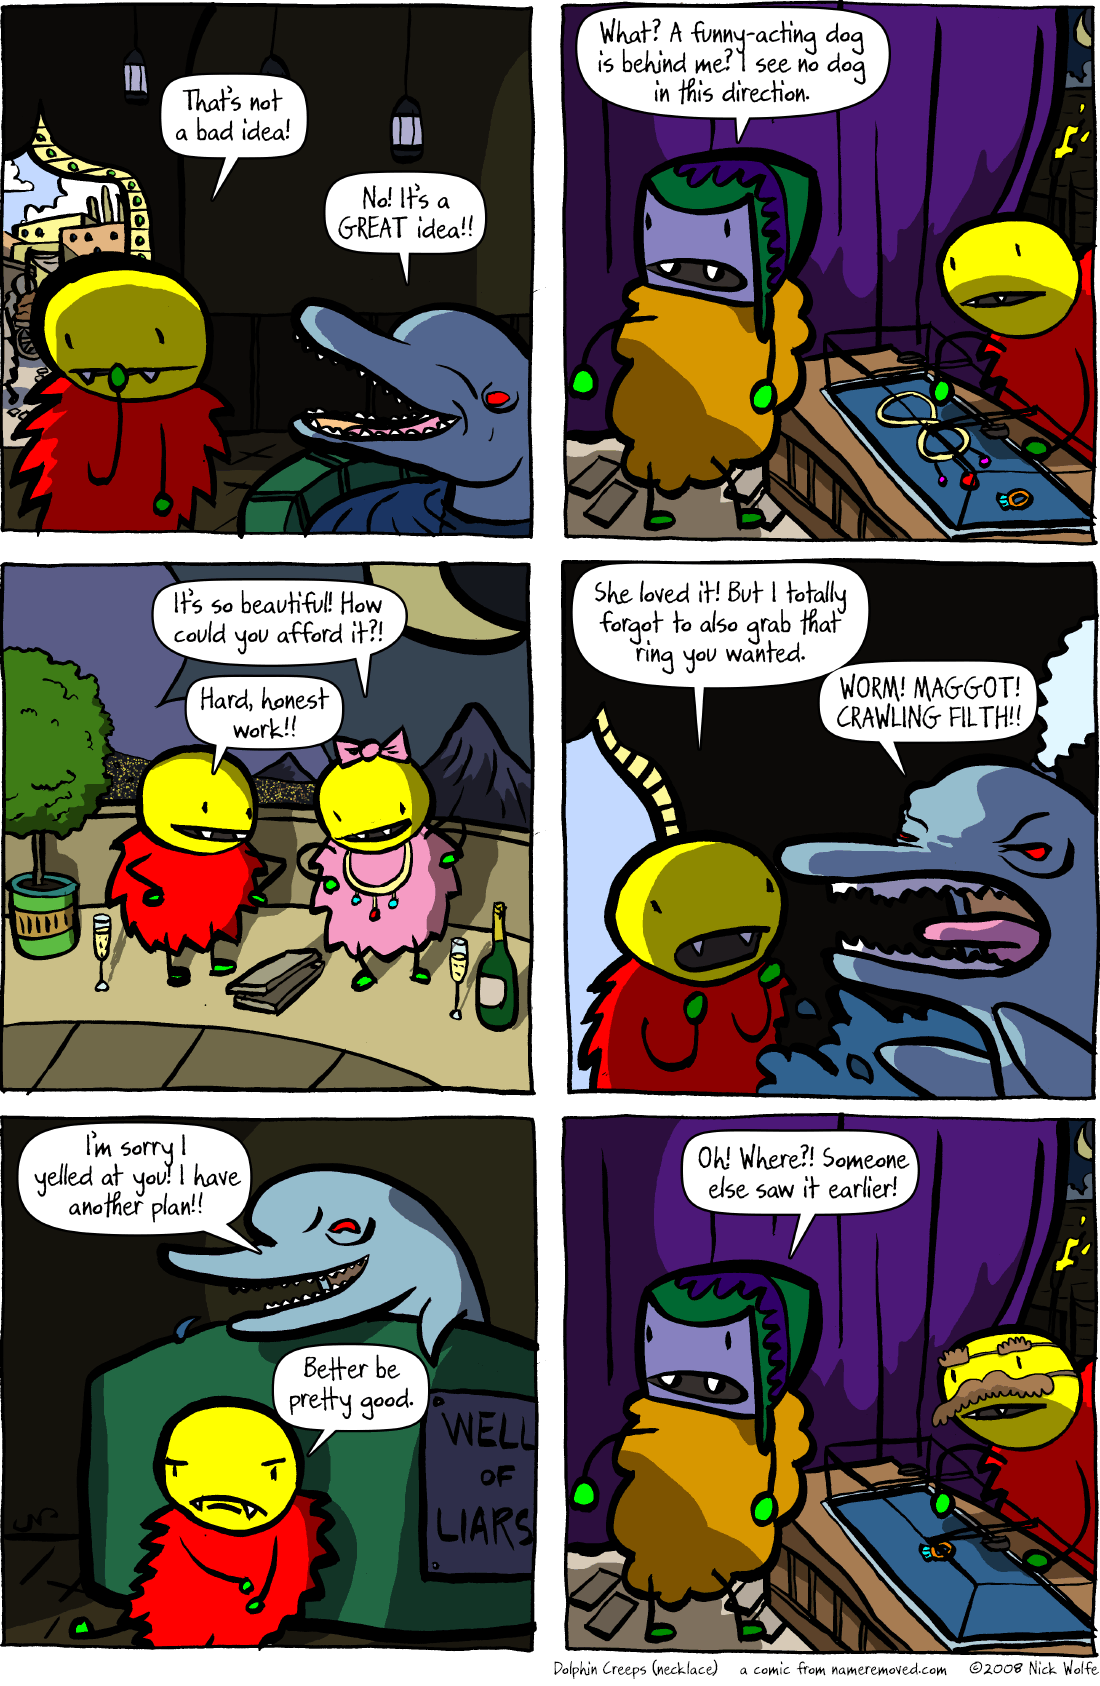 Dolphin Creeps (necklace)